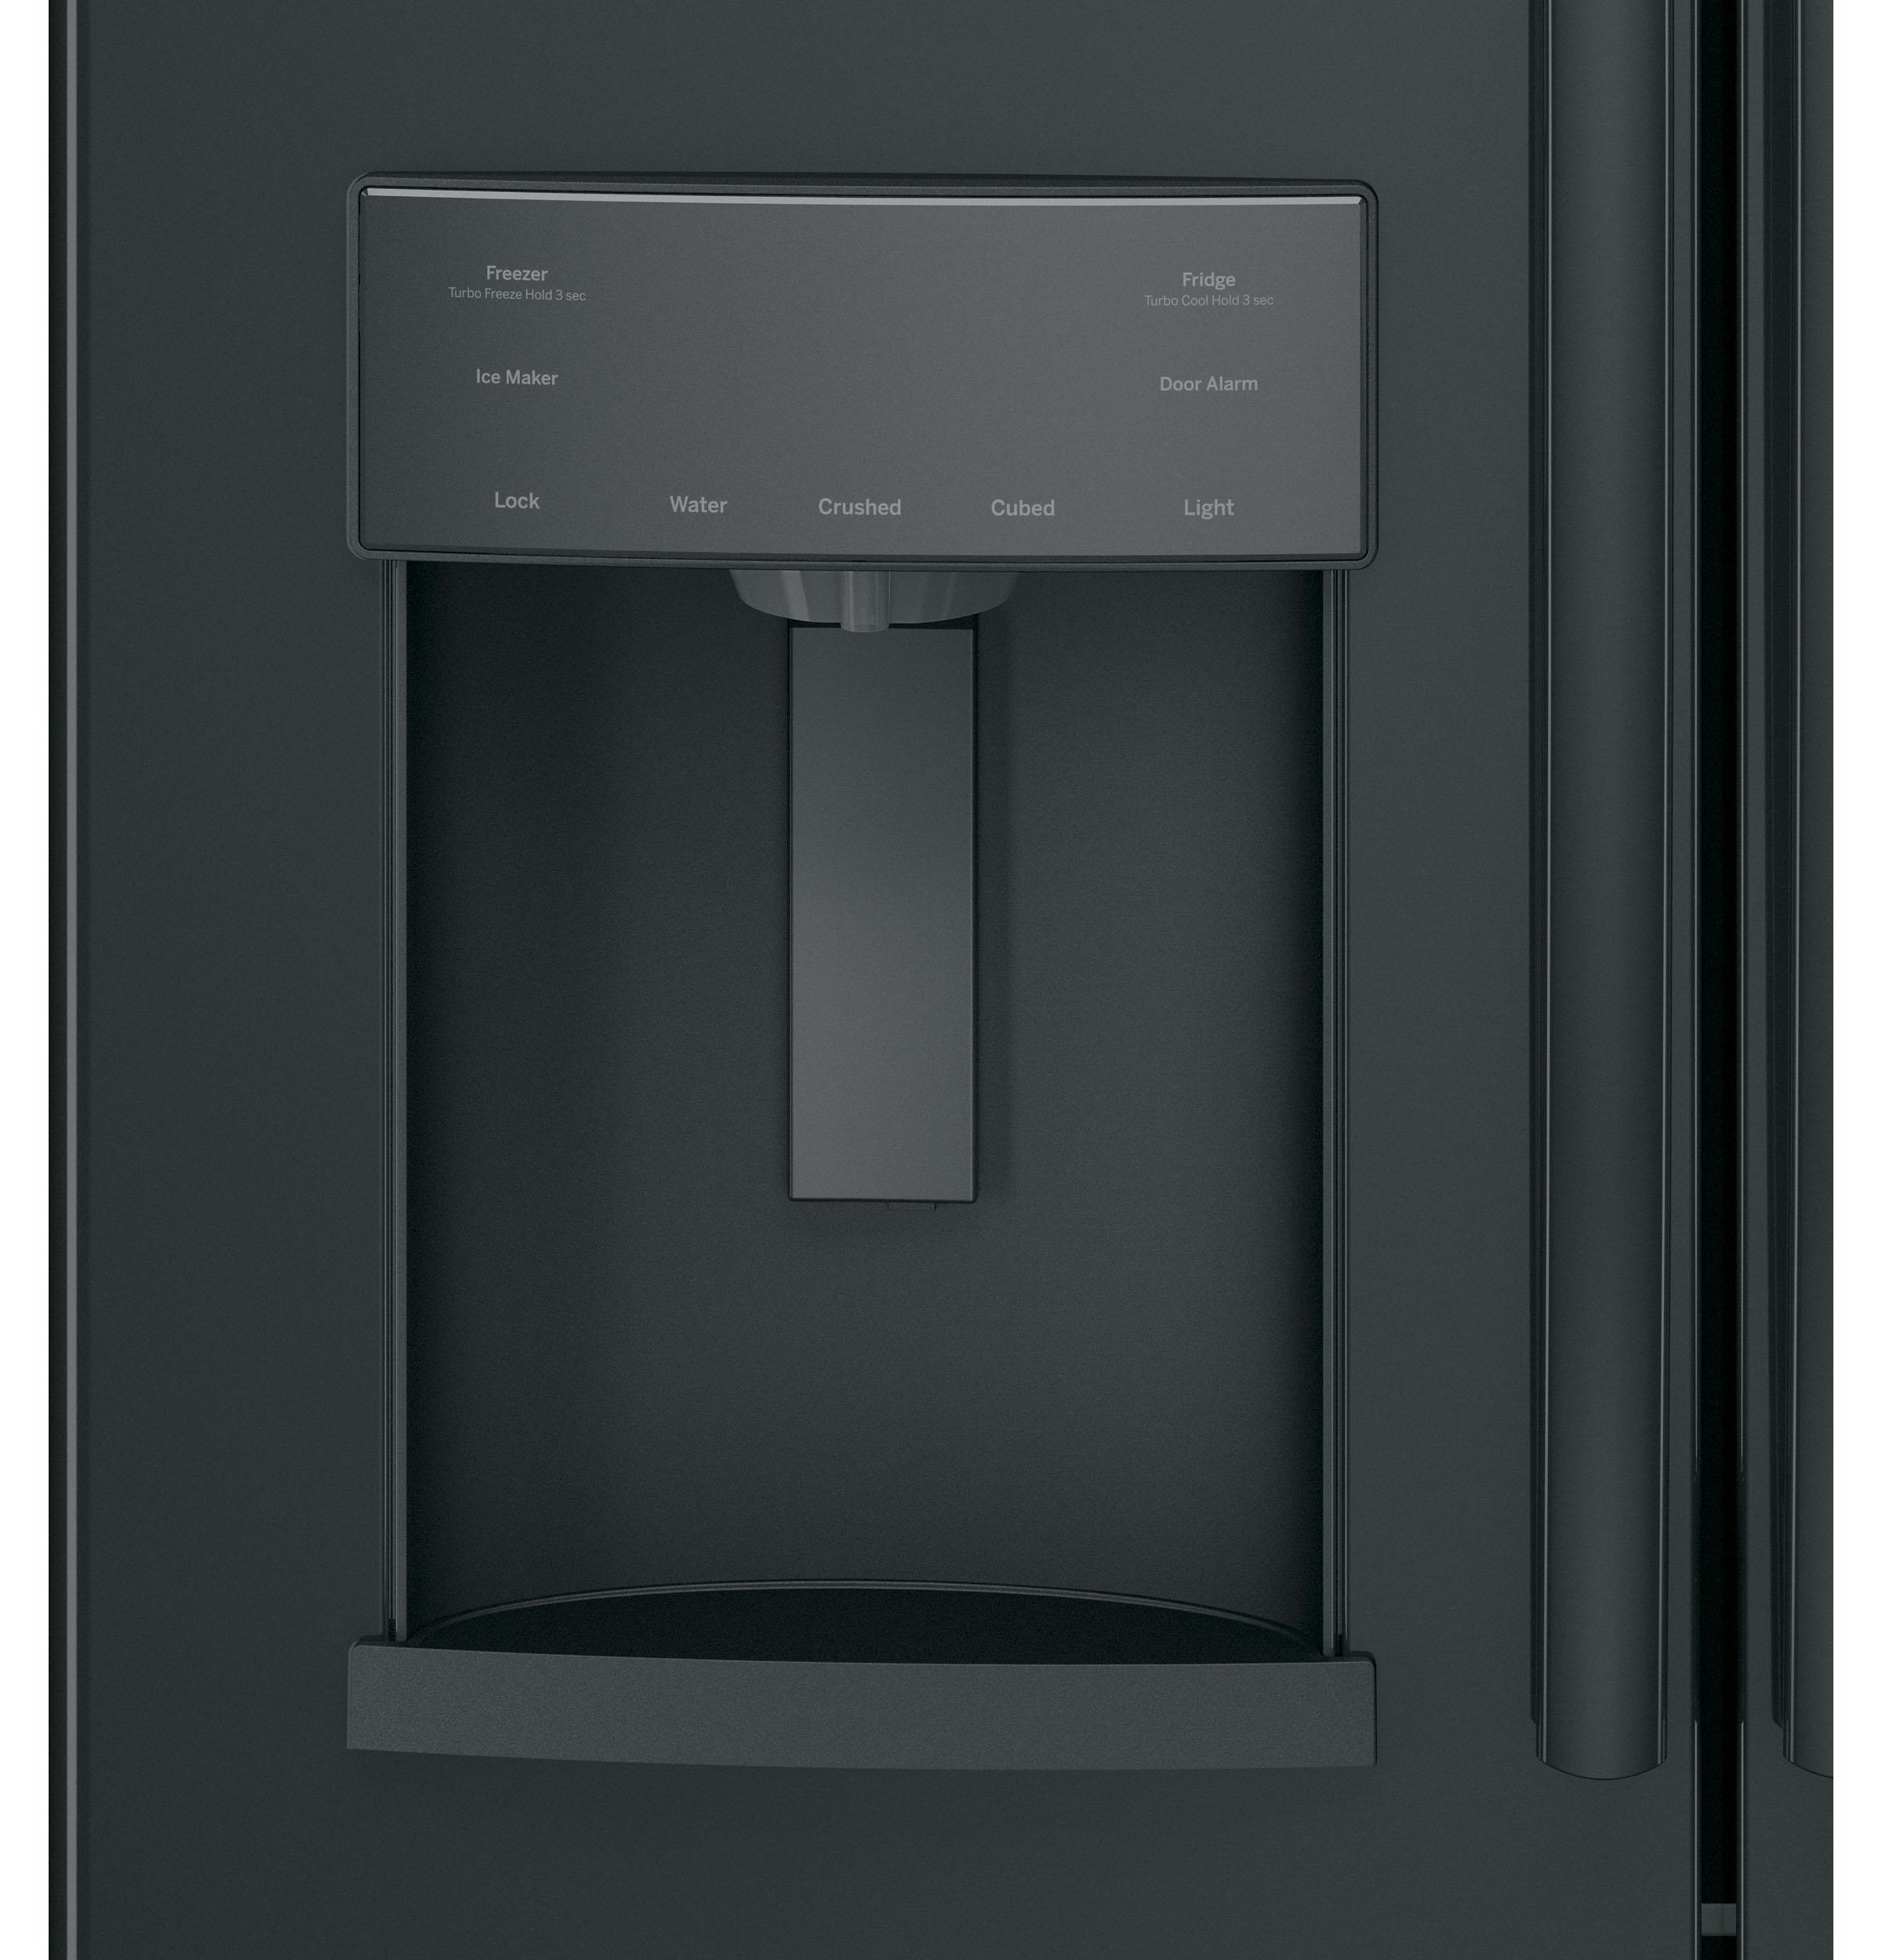 GE Appliances GFE28GGKBB 27.8 cu. ft. French Door Refrigerator - Black